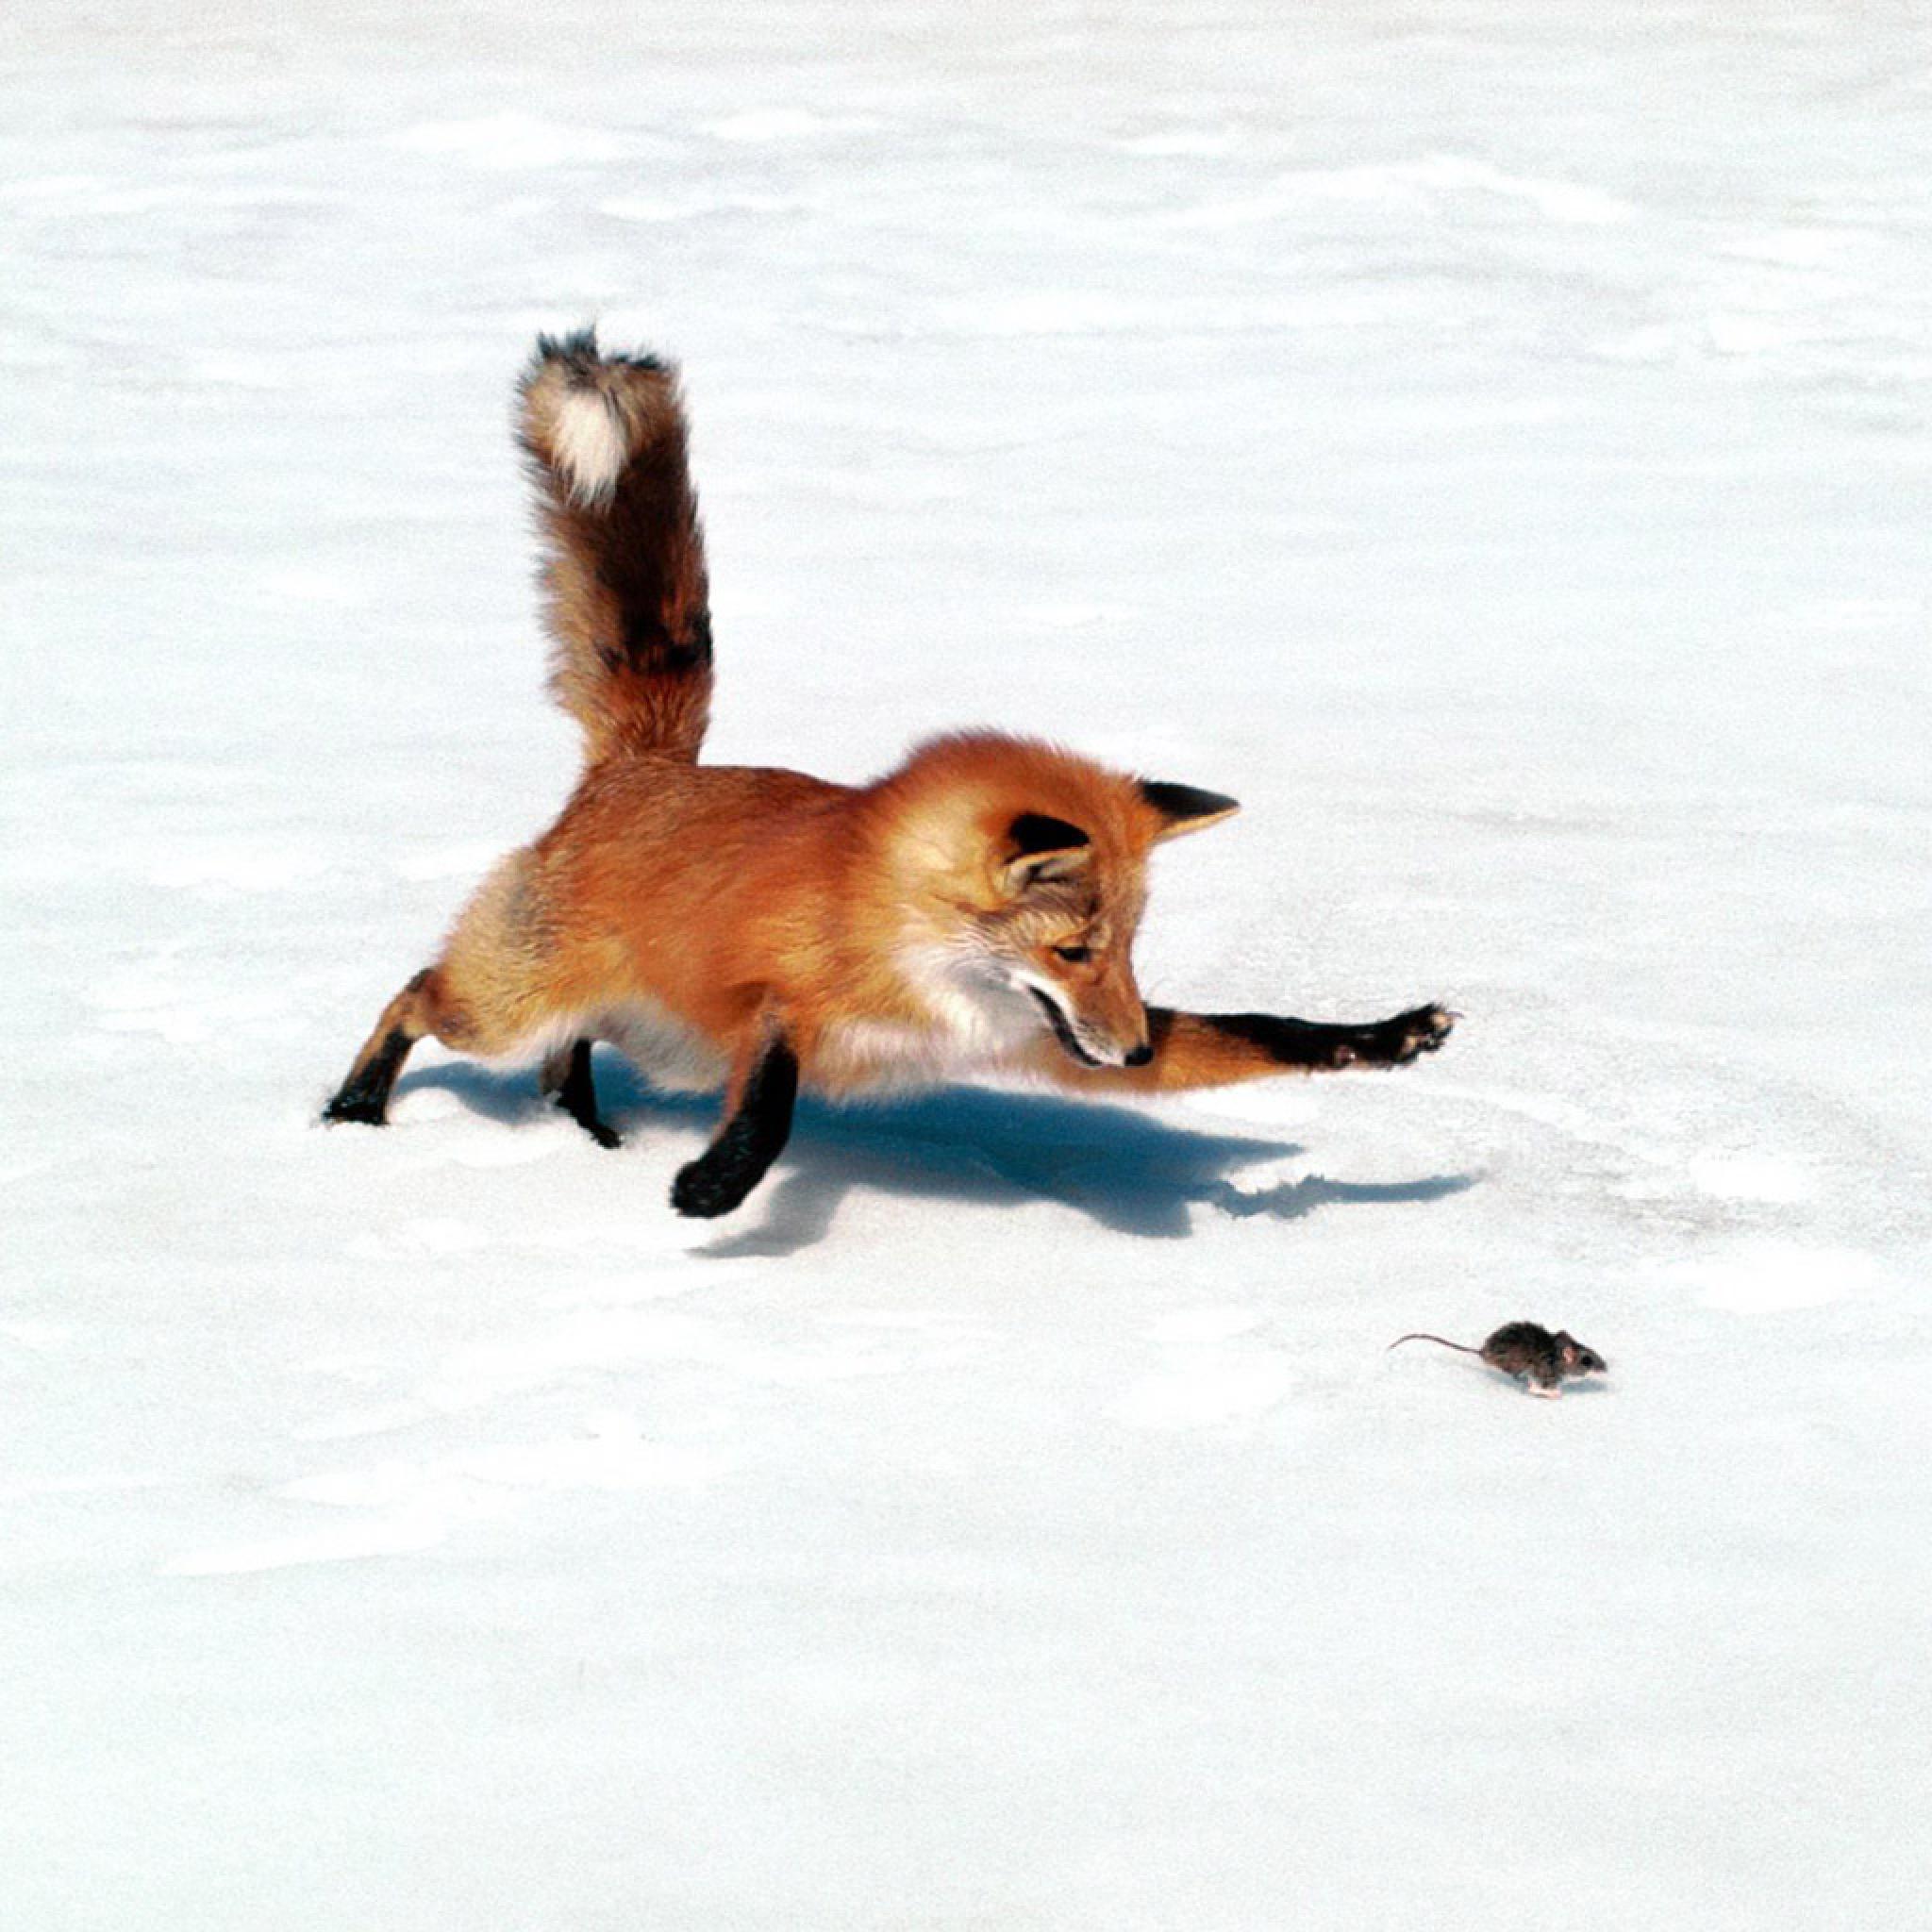 Animals   Red Fox Hunting Mice   iPad iPhone HD Wallpaper 2048x2048